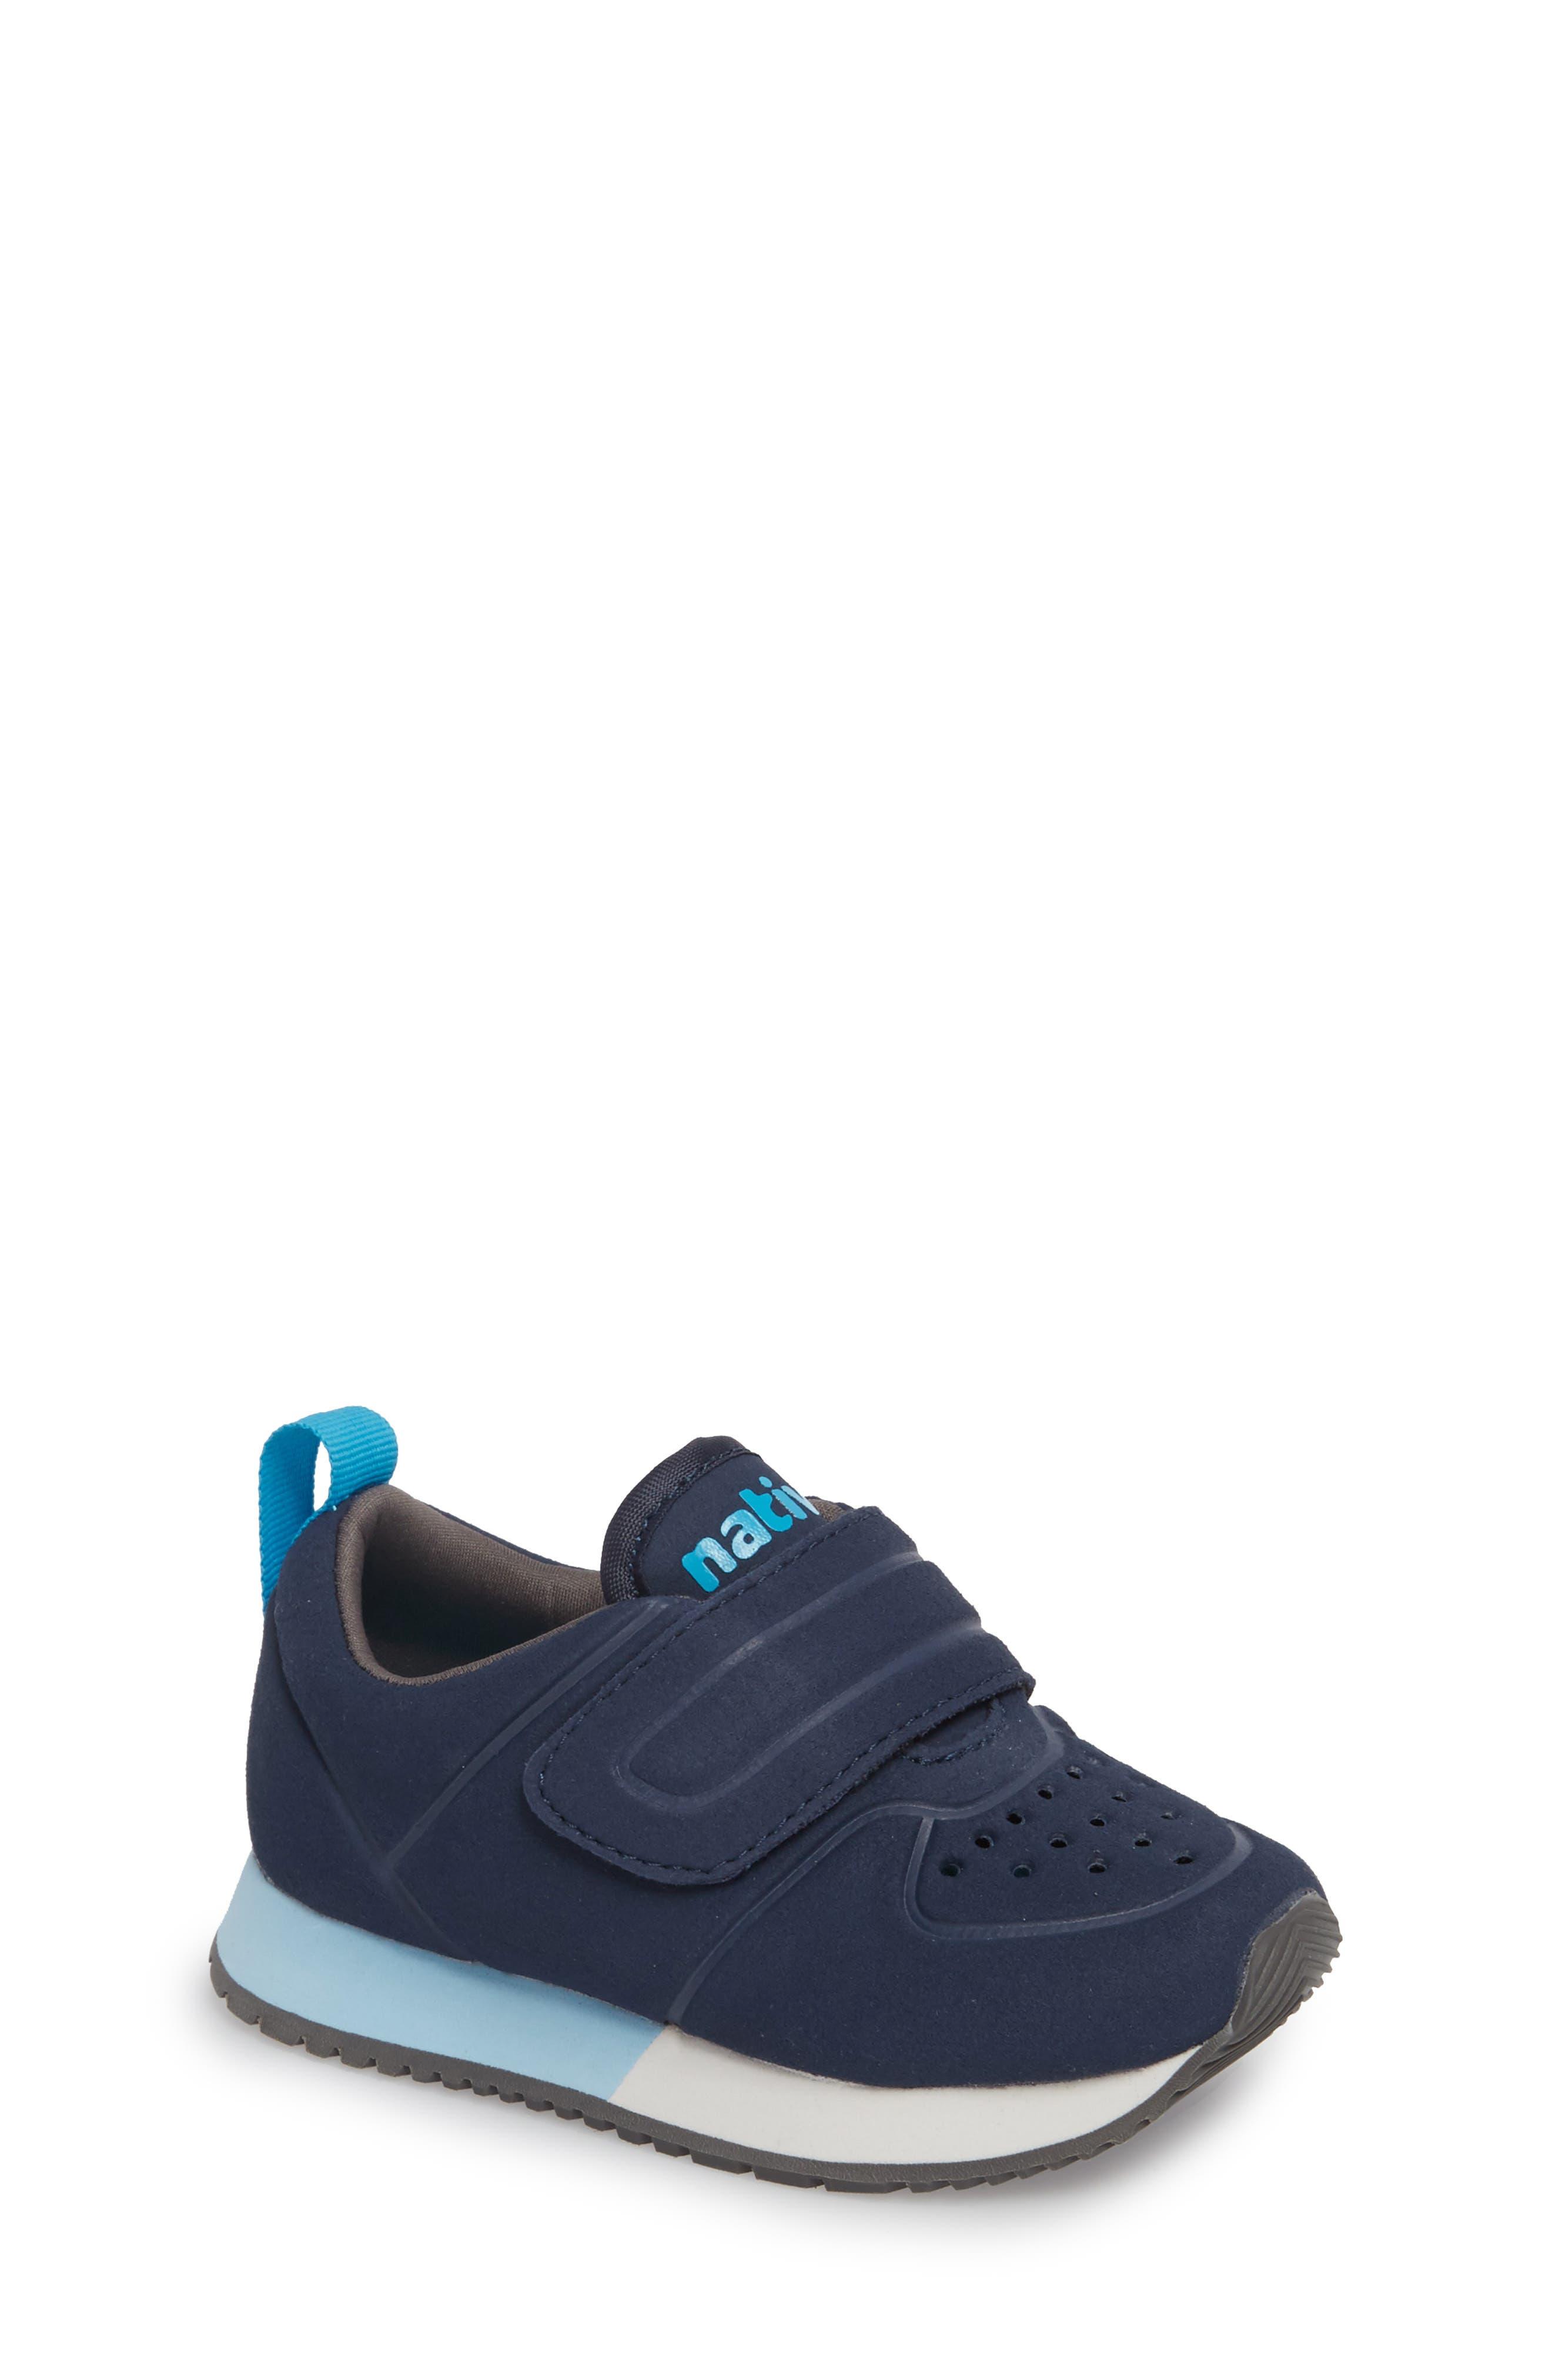 Native Cornell Perforated Sneaker,                             Main thumbnail 1, color,                             REGATTA BLUE/ SHELL WHITE